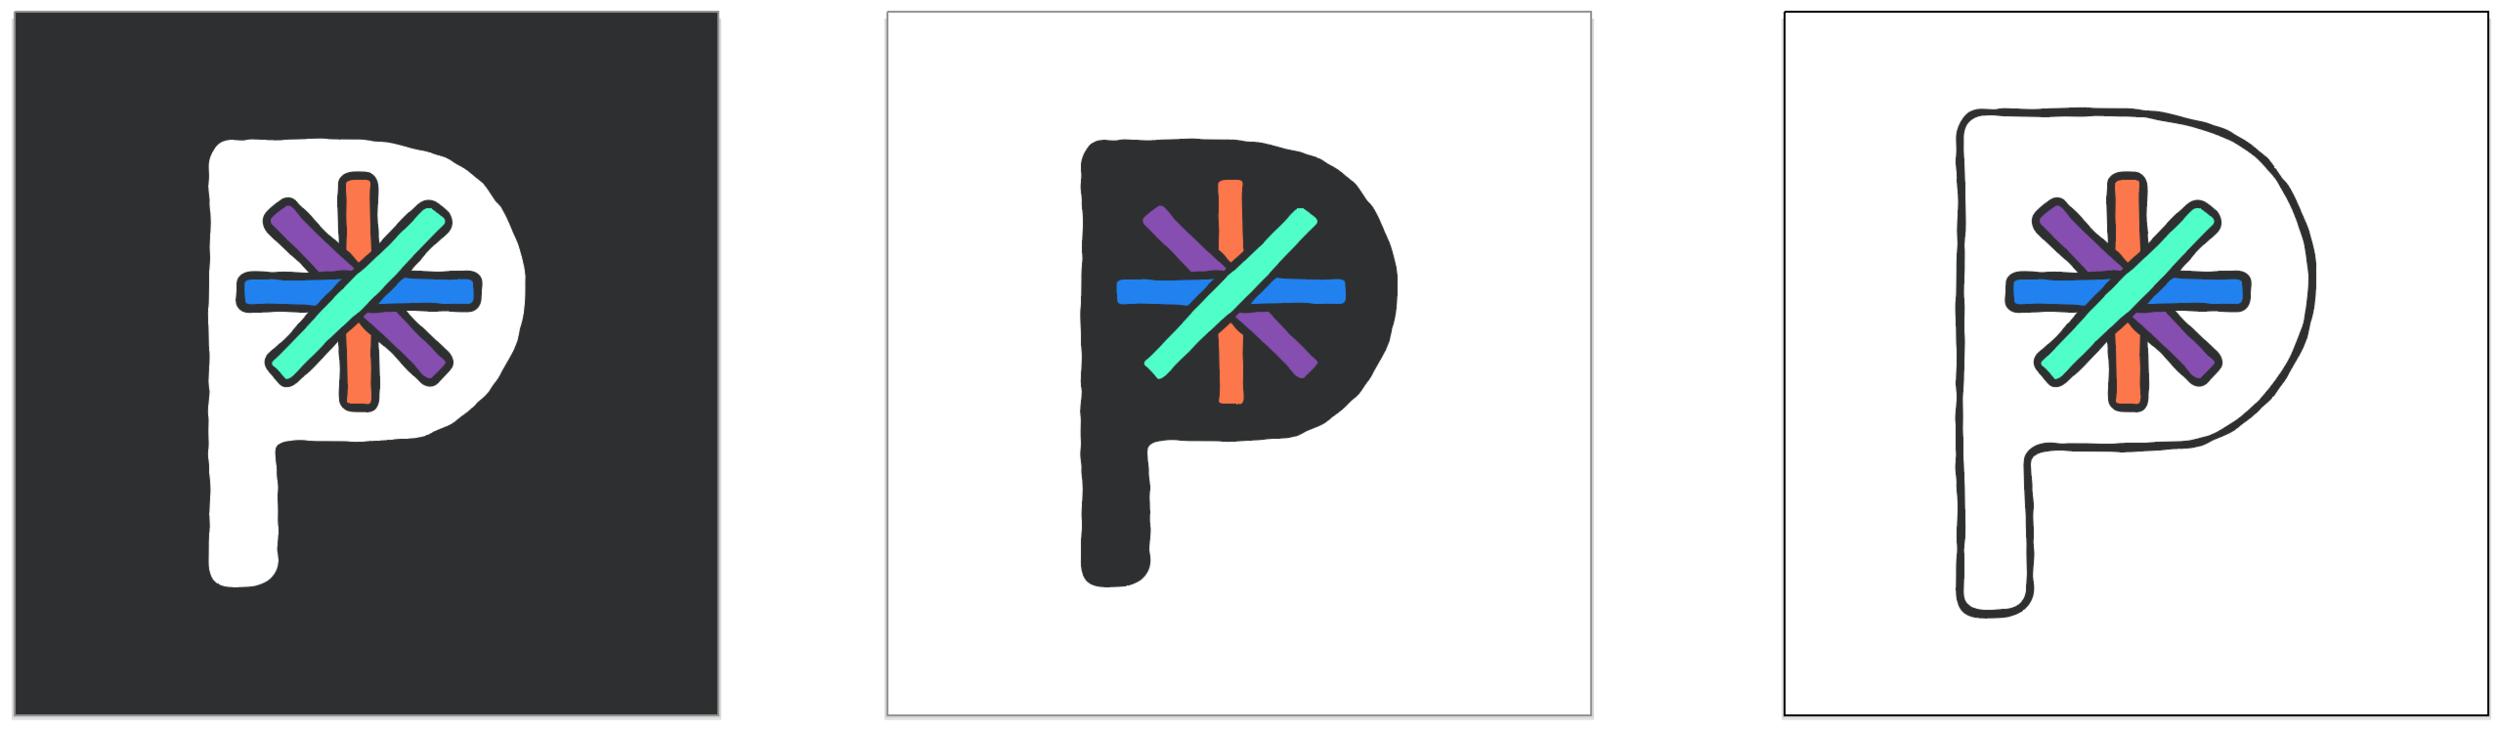 Propeller design studio logo